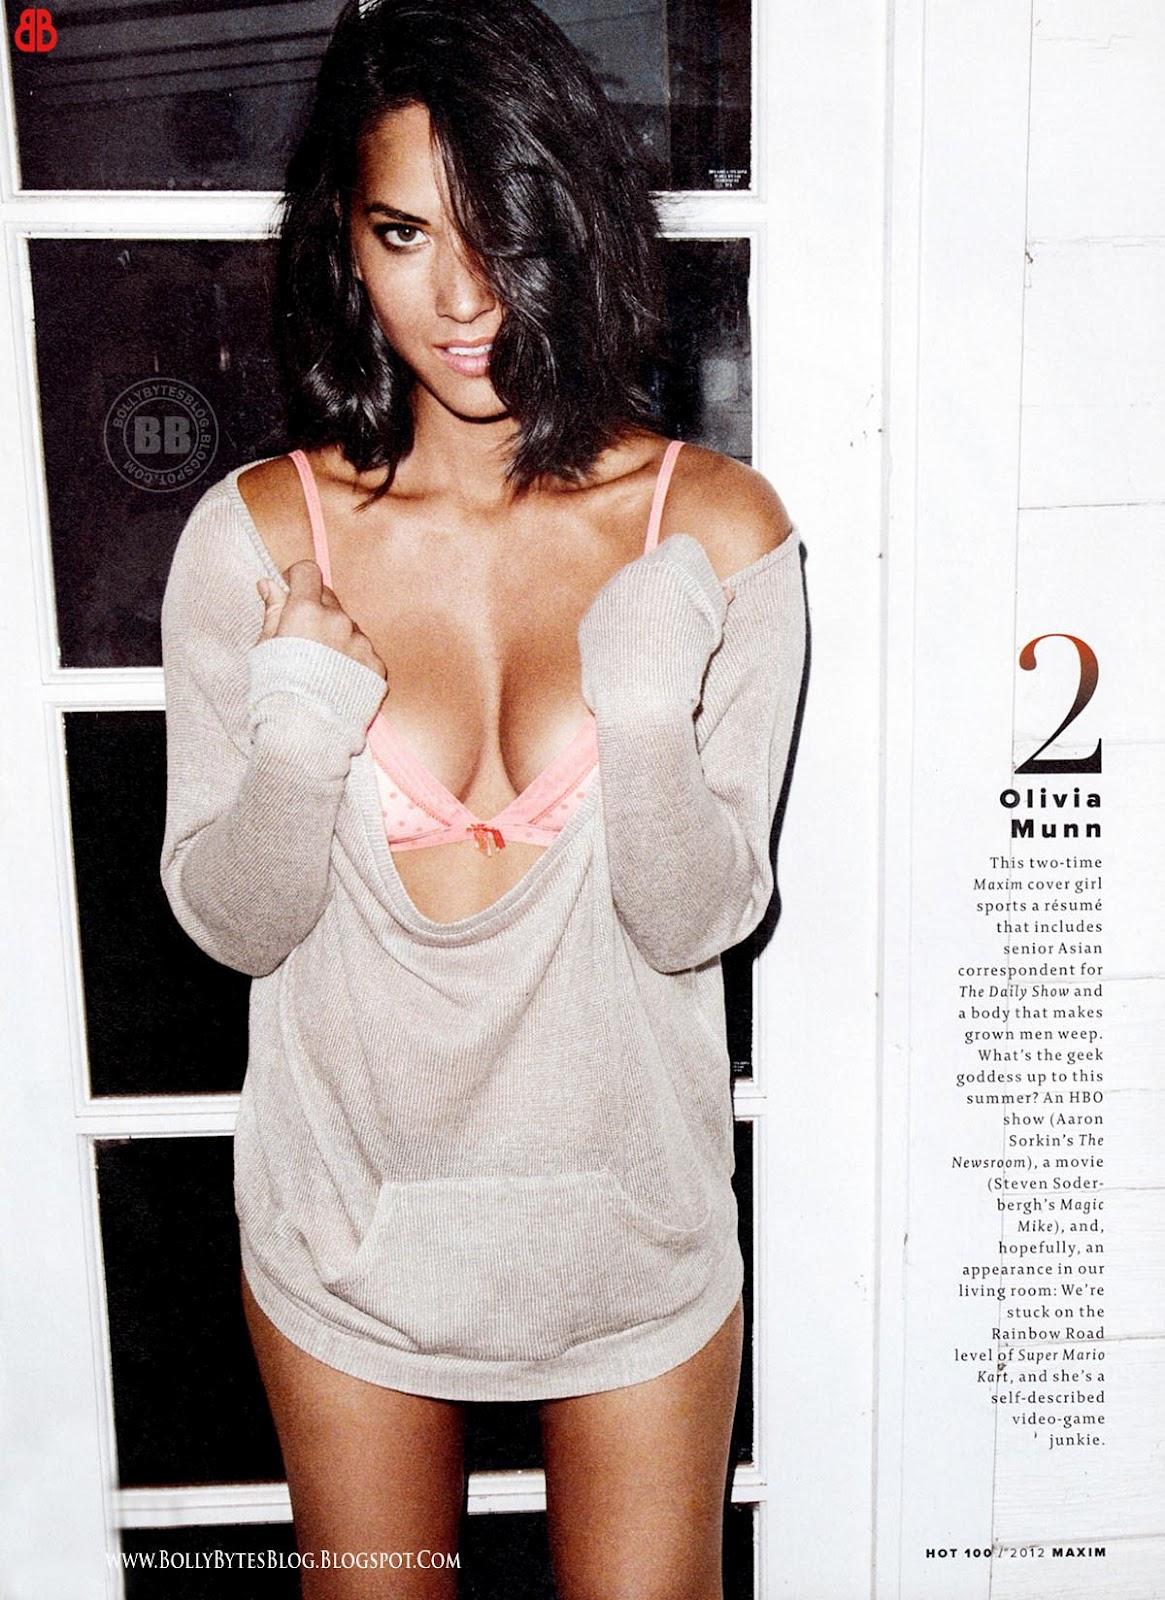 http://2.bp.blogspot.com/-HgVYXNUxeAE/T8EsOICgsWI/AAAAAAAAJc8/rS4JK9QwQs8/s1600/Maxim-Magazine-Hot-100-List-2012-Hot-Olivia-Munn-Rank-2-Photos-02.jpg